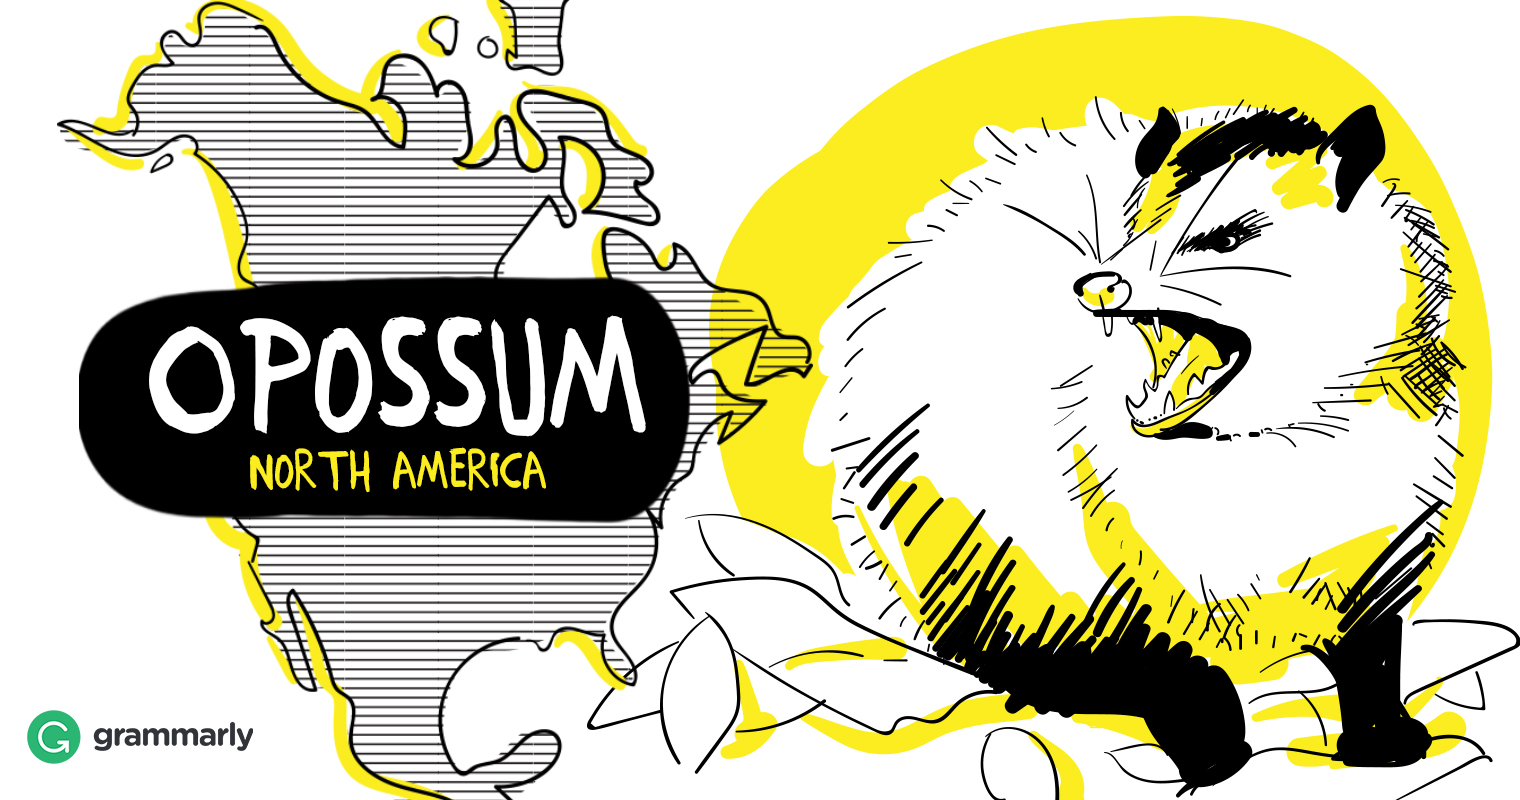 1520x800 Opossum Vs. Possum Is It The Same Animal Grammarly